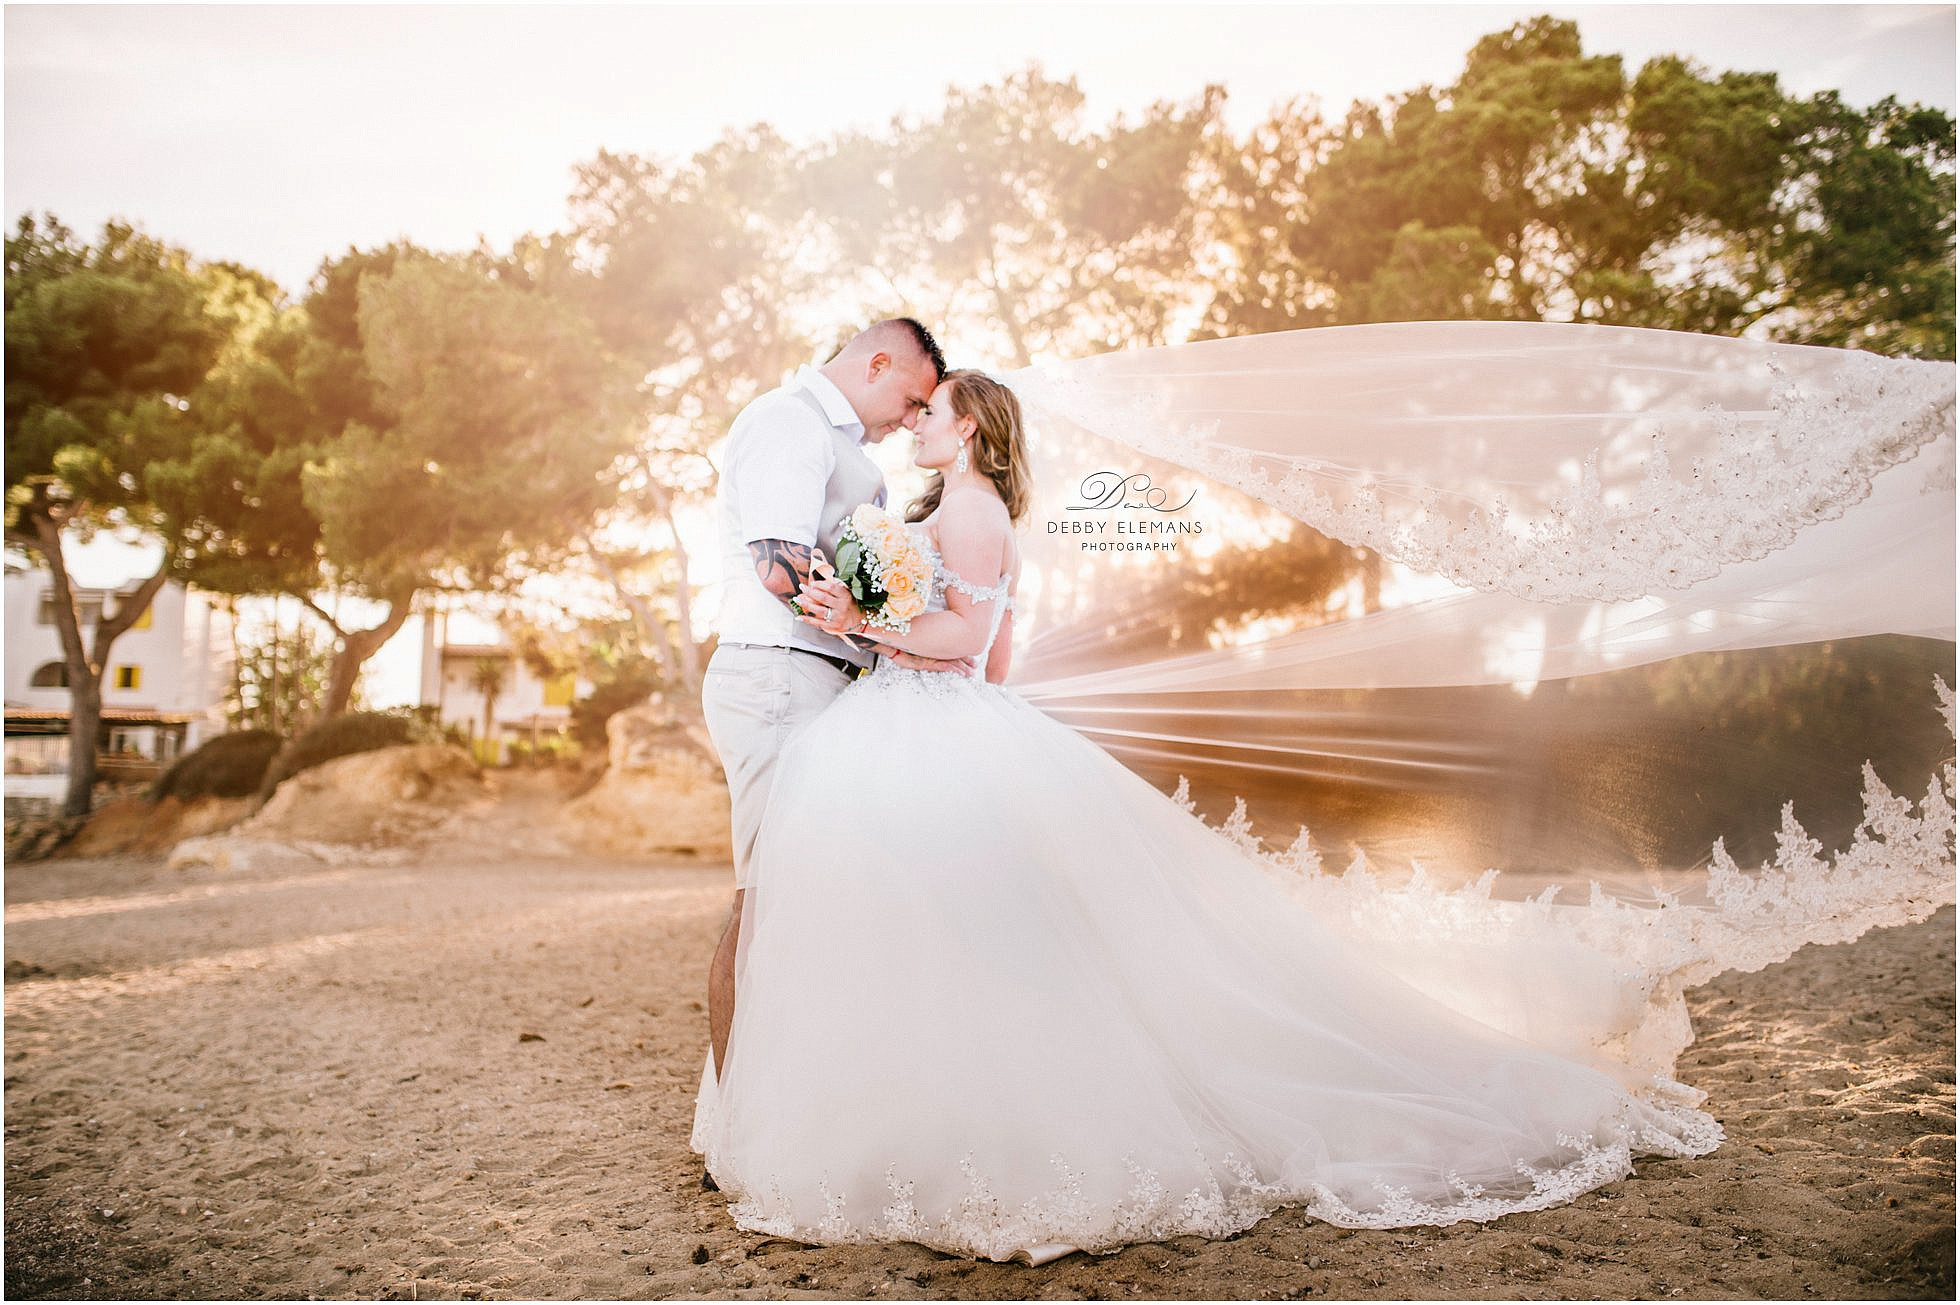 Ibiza Wedding  © Debby Elemans Photography